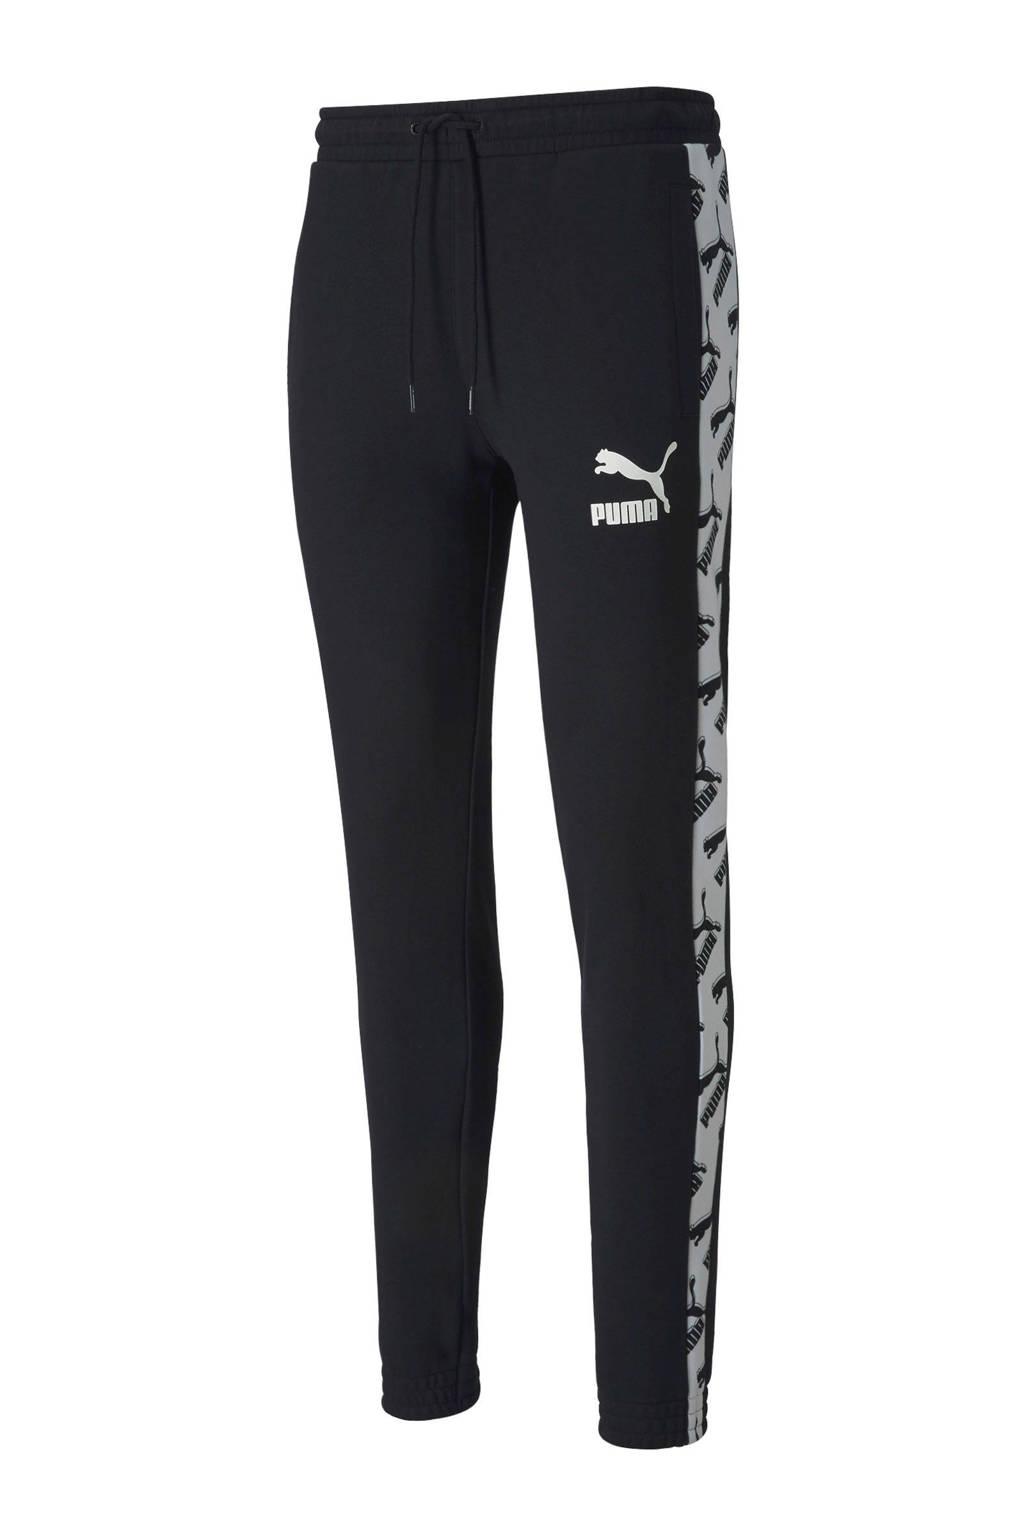 Puma   joggingbroek zwart/wit, 100% katoen